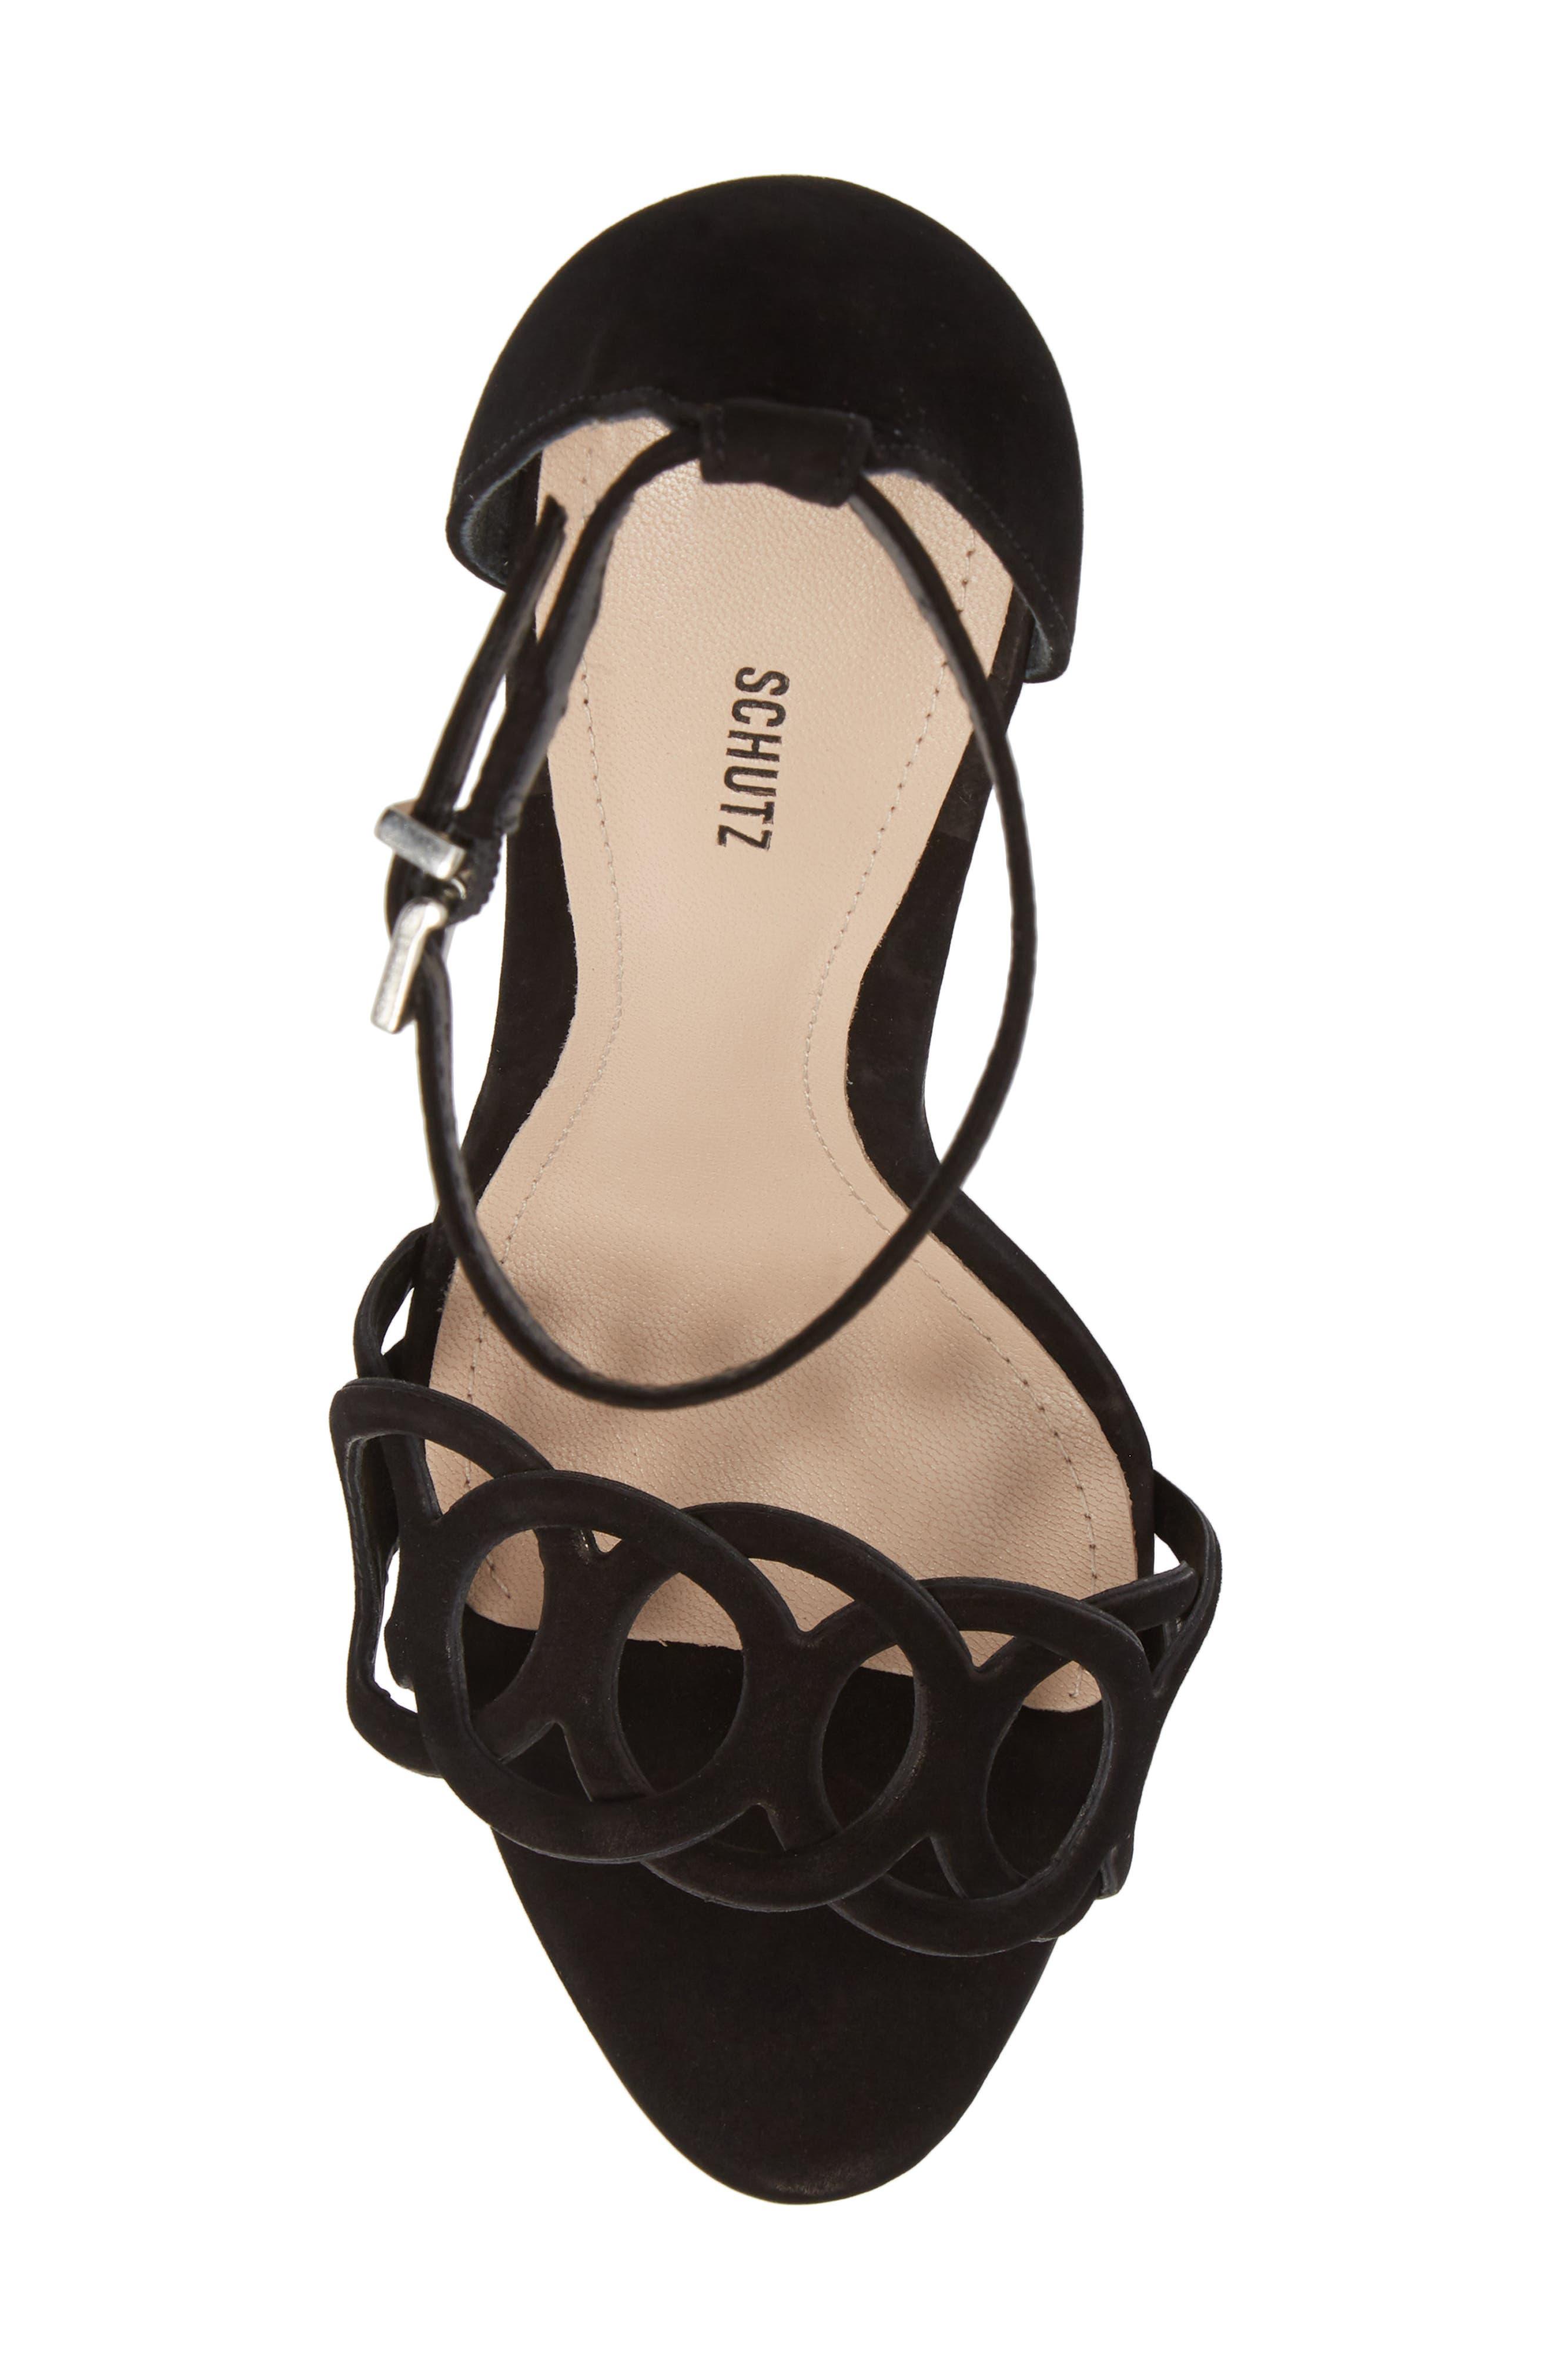 Sthefany Ankle Strap Sandal,                             Alternate thumbnail 5, color,                             BLACK LEATHER